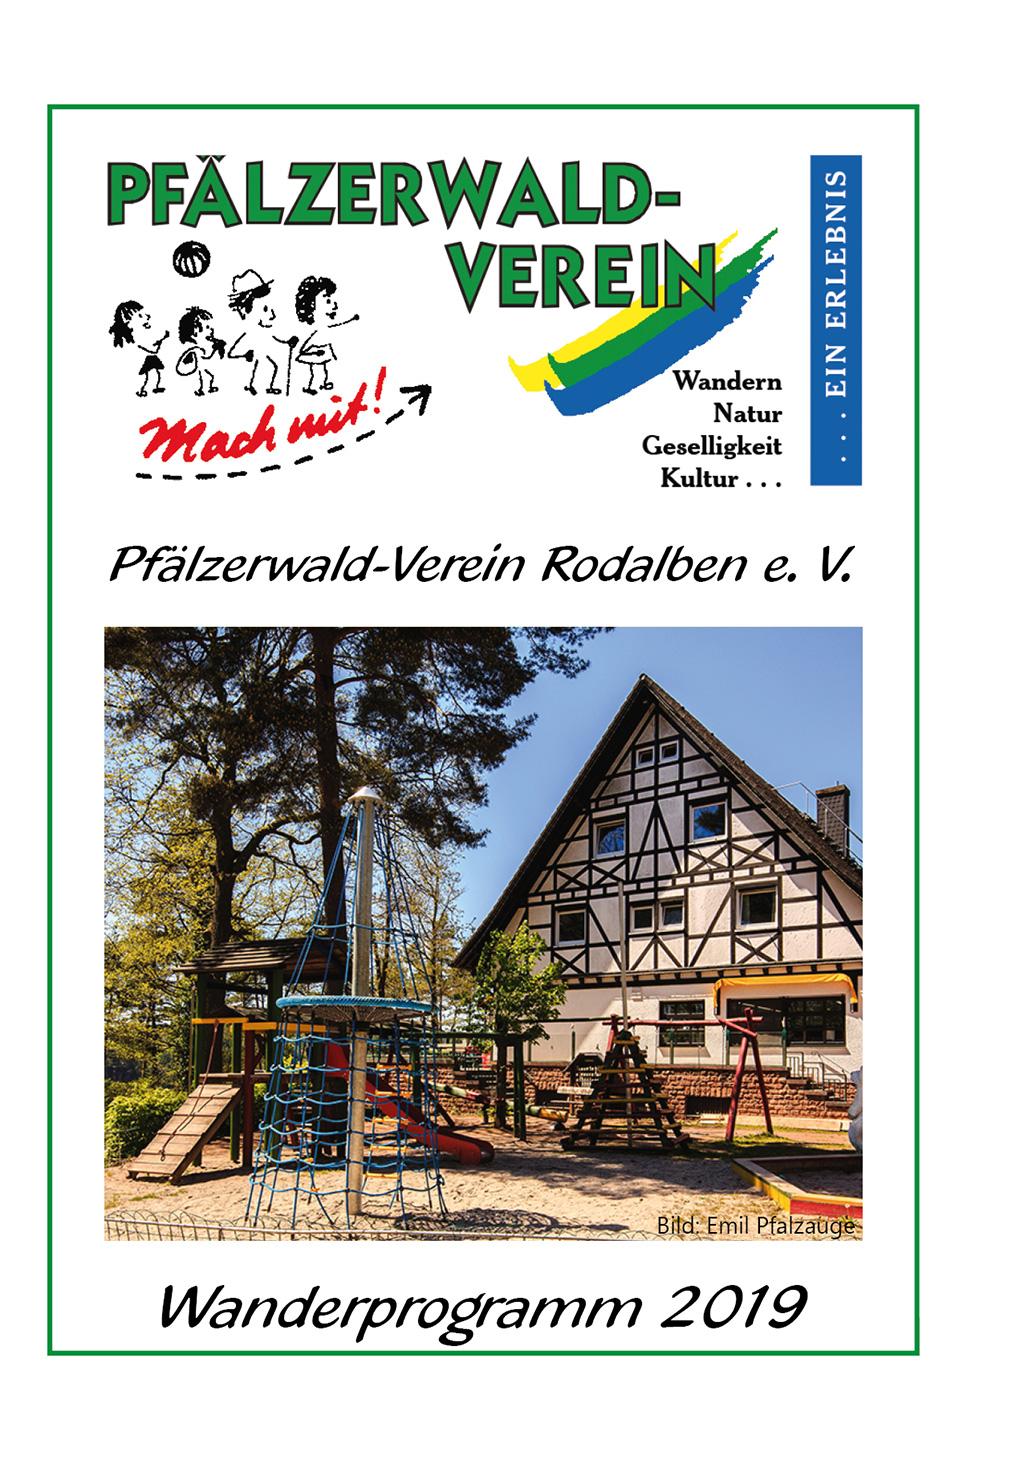 Wanderplan 2019 Pwv Rodalben Hilschberghaus